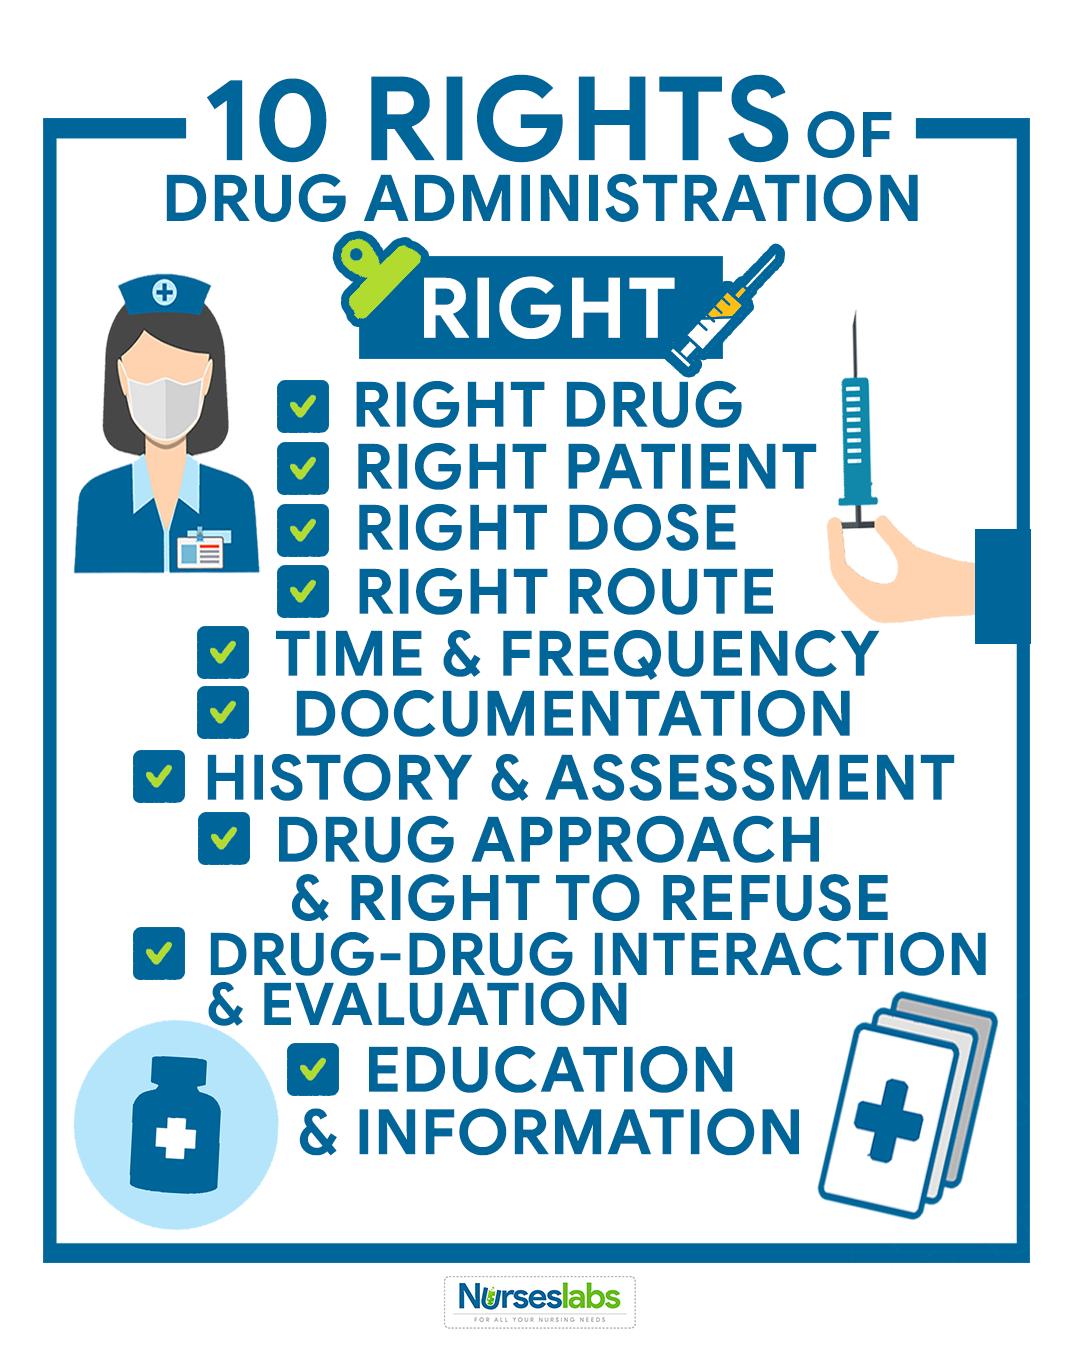 The 10 Rights of Drug Administration Nursing school